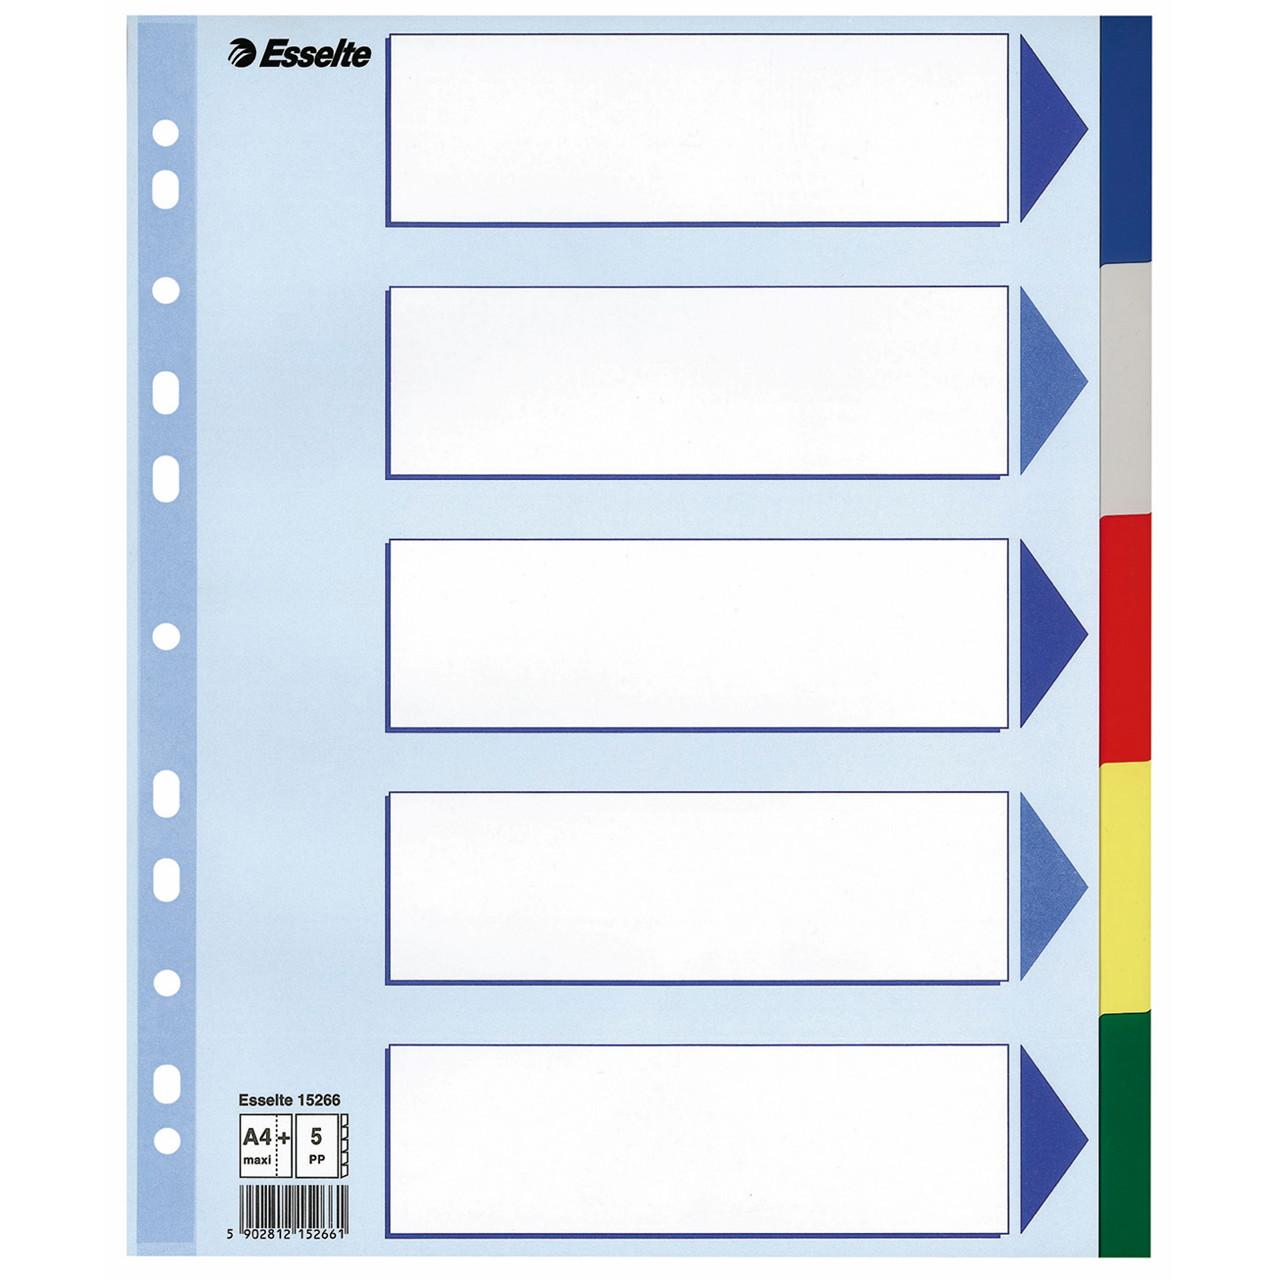 Faneblade 1-5 Esselte A4 maxi - farvede plastfaner med kartonforblad ... a0115169ebb27